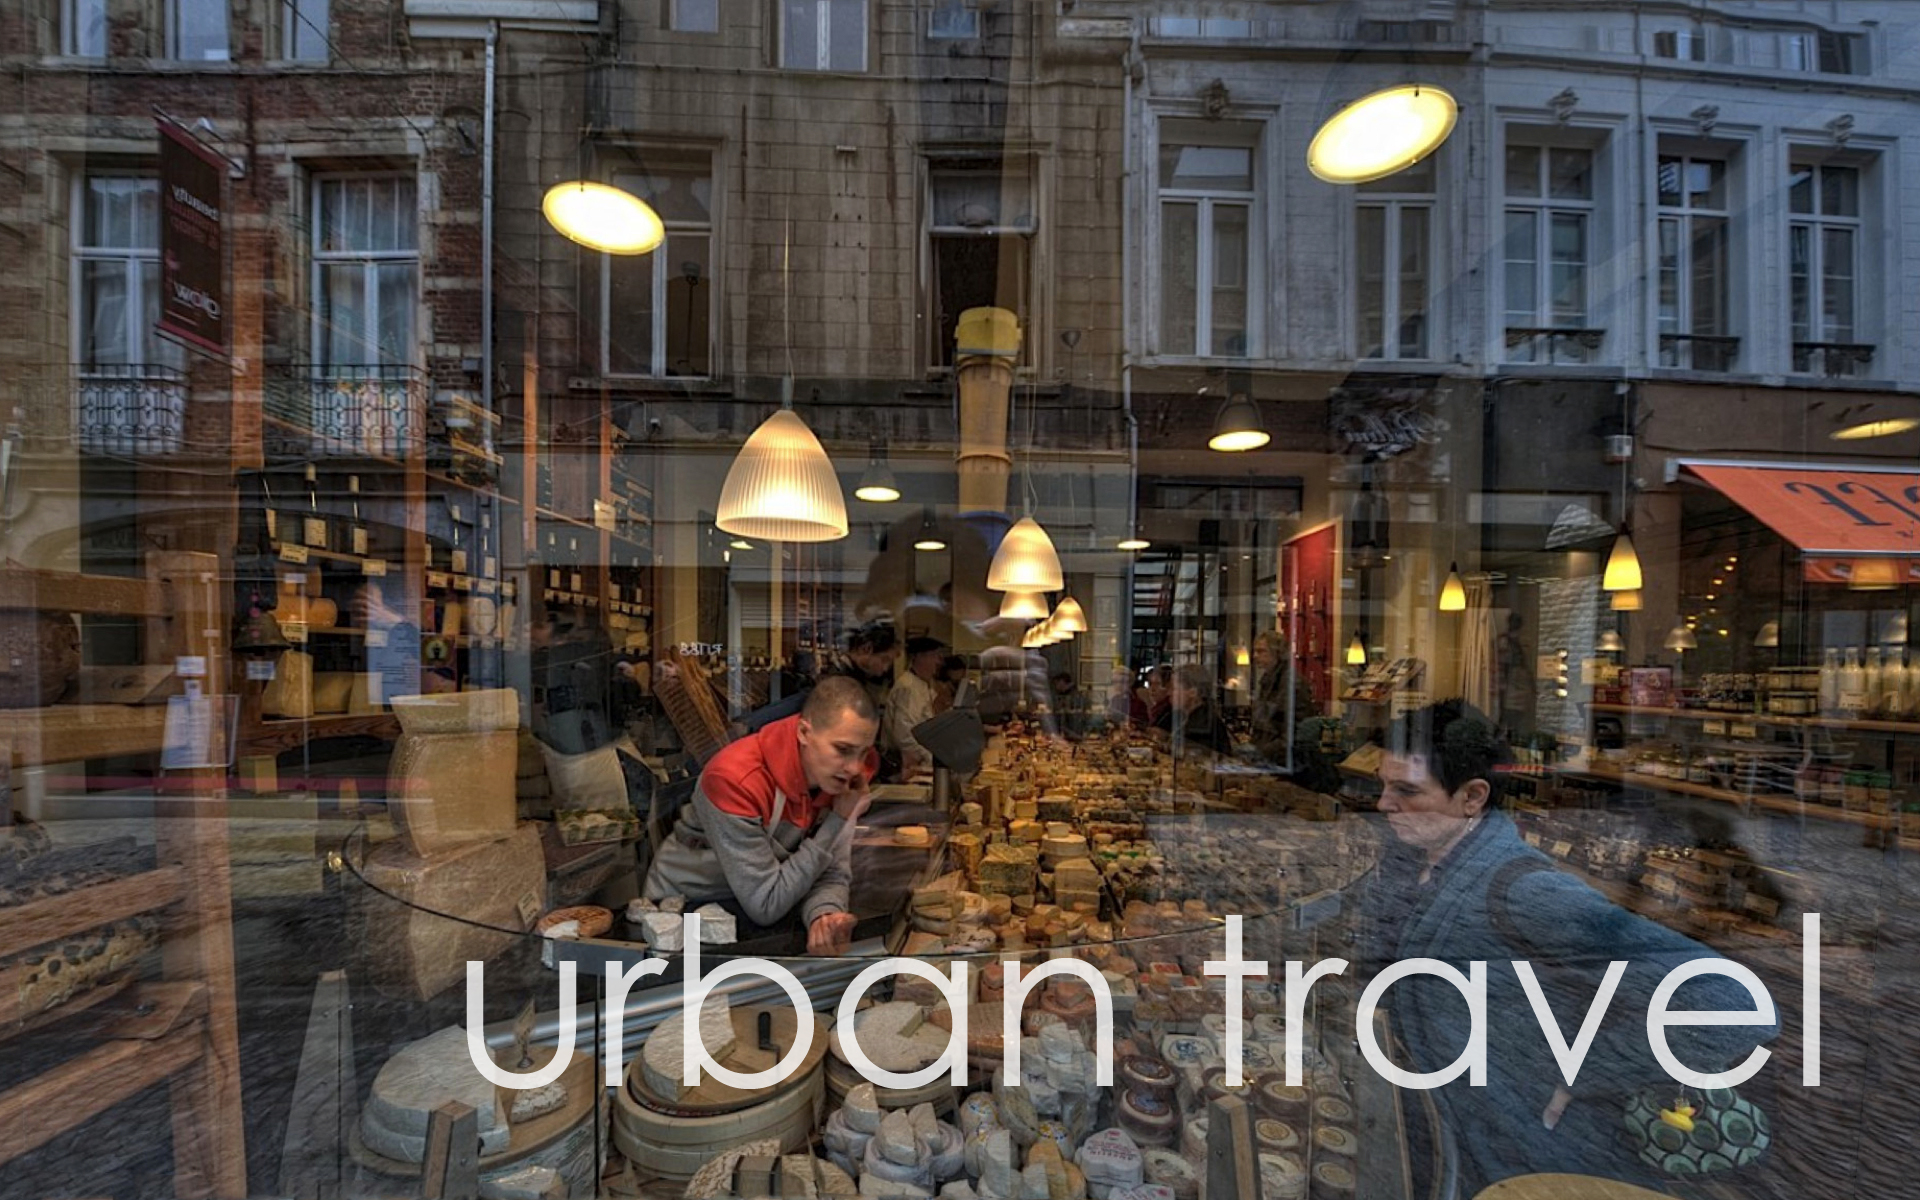 Urban Travel